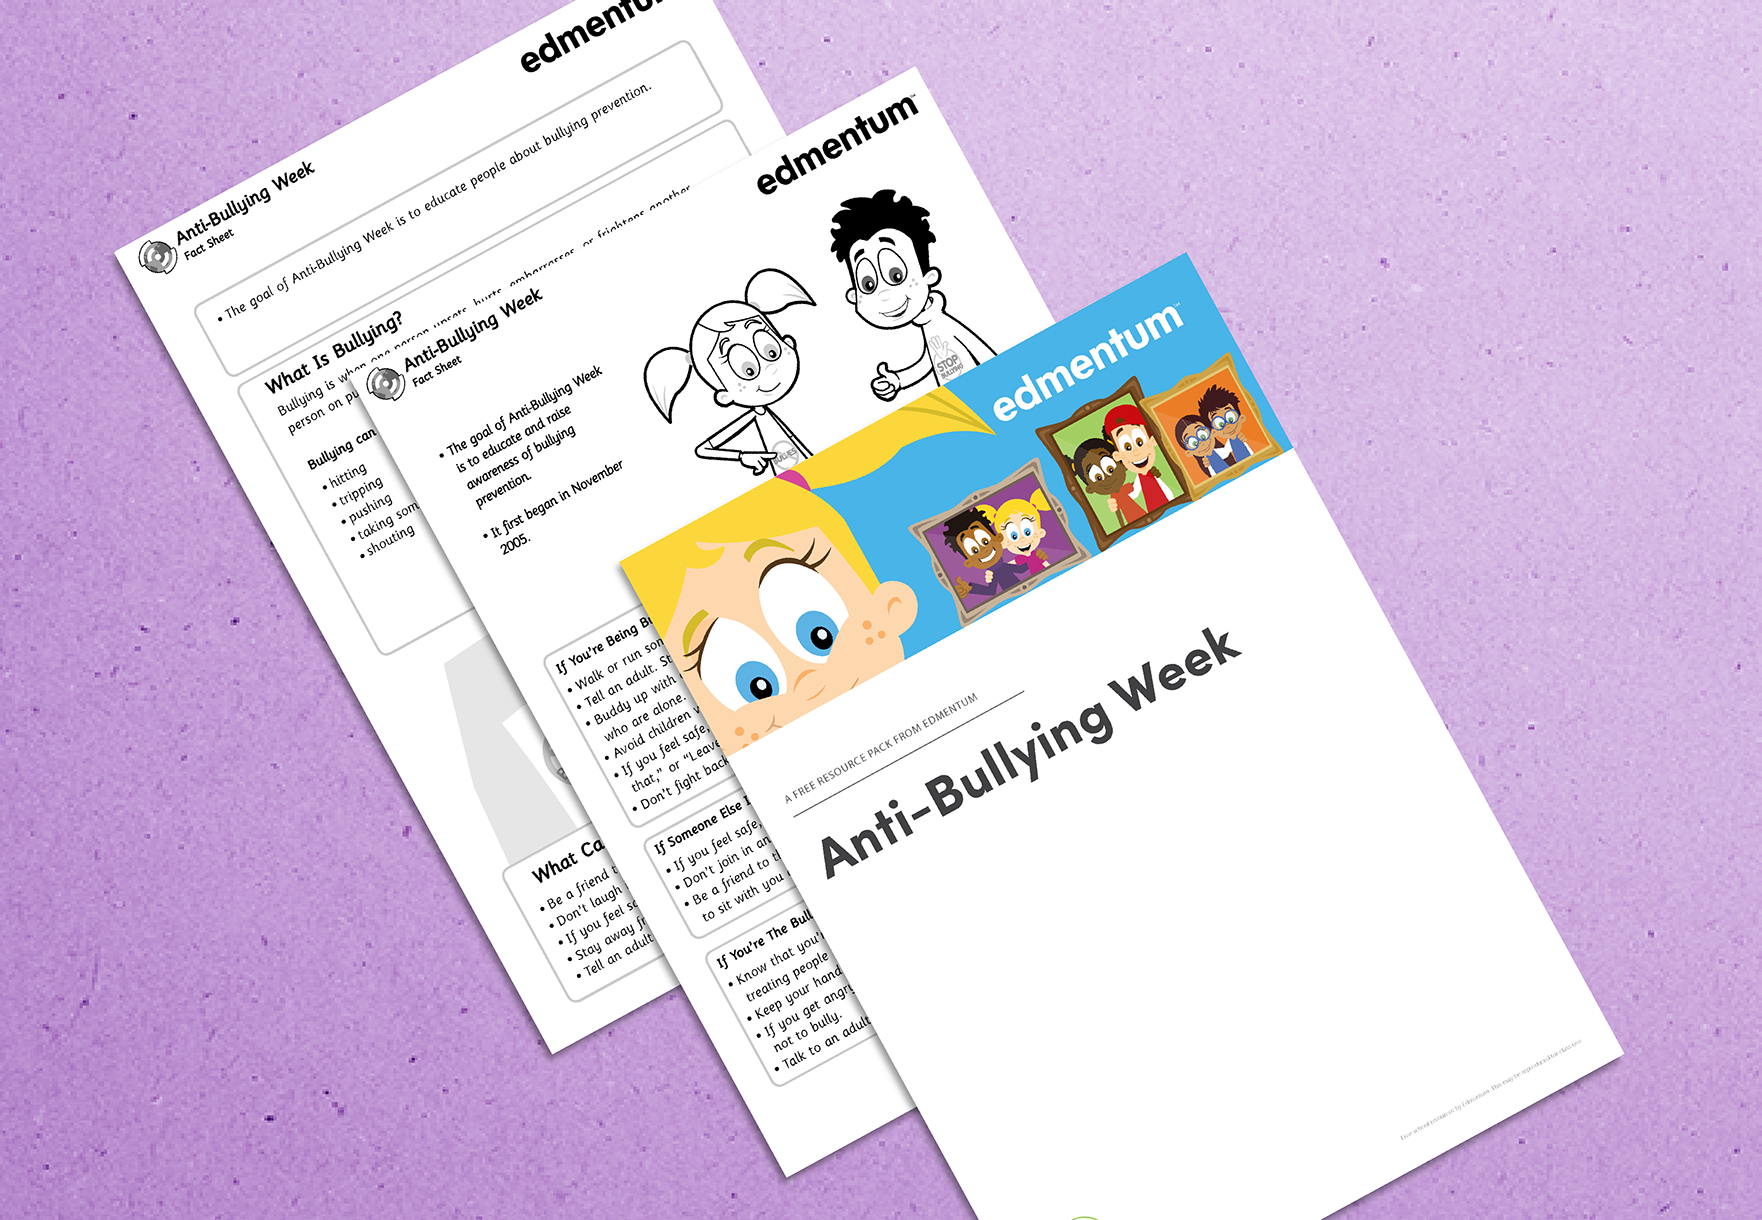 Anti-Bullying Week Pack